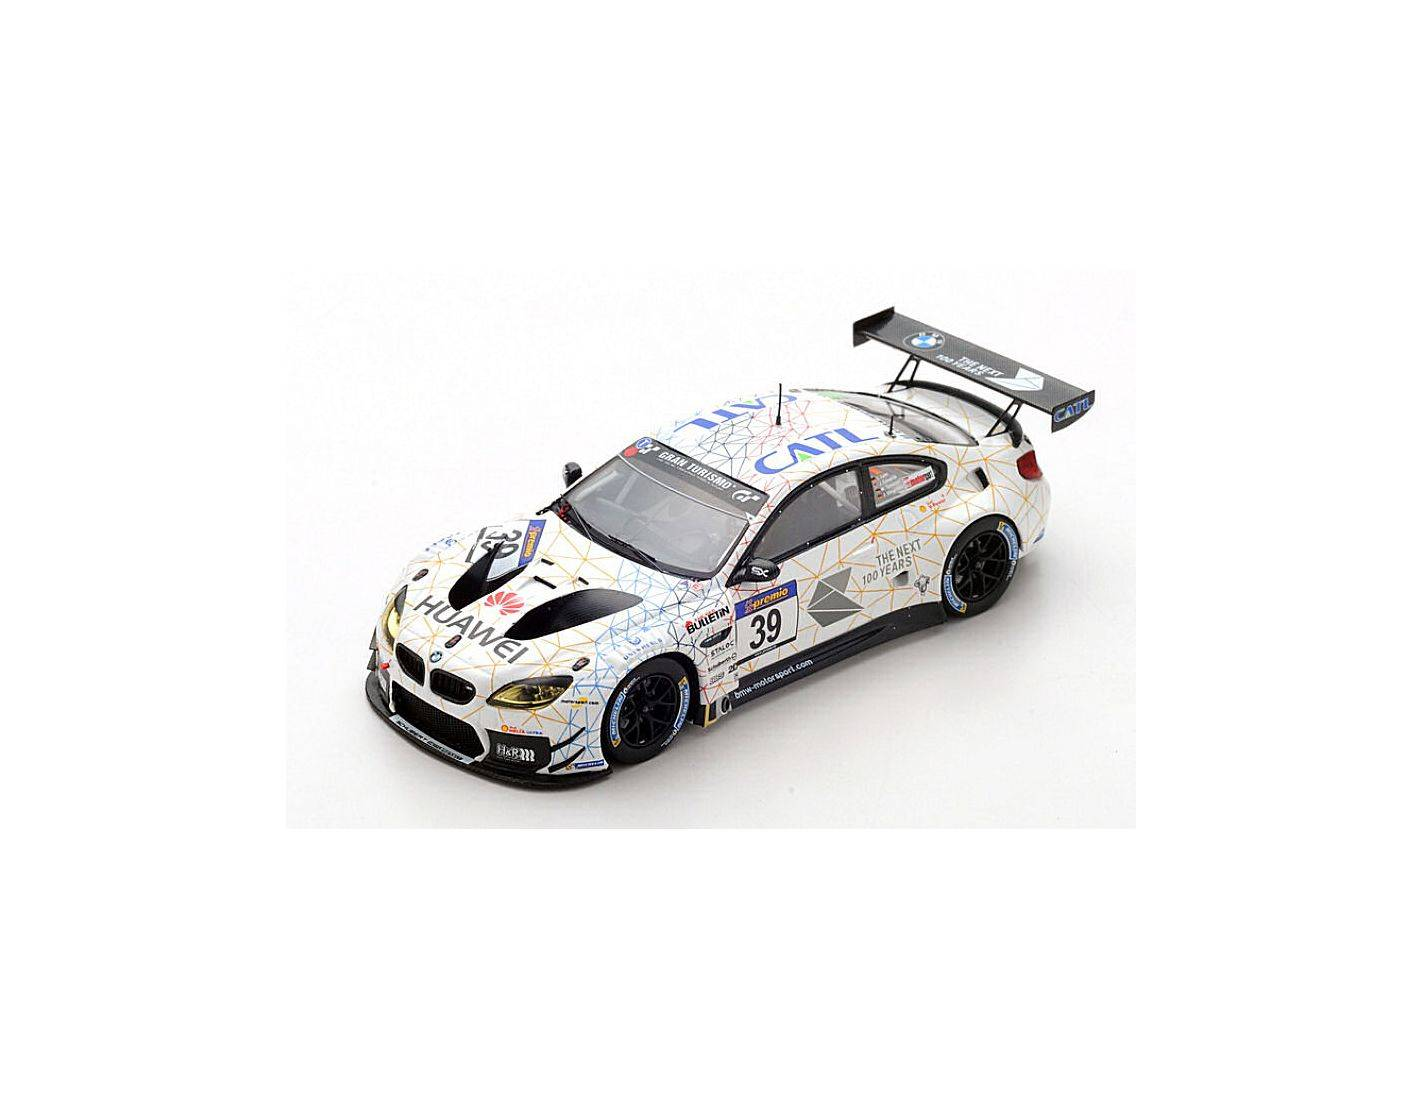 Spark Model SG371 BMW M6 N.39 2nd VLN 2016 ROUND 3 L.LUHR-M.TOMCZYK-J.EDWARDS 1:43 Modellino